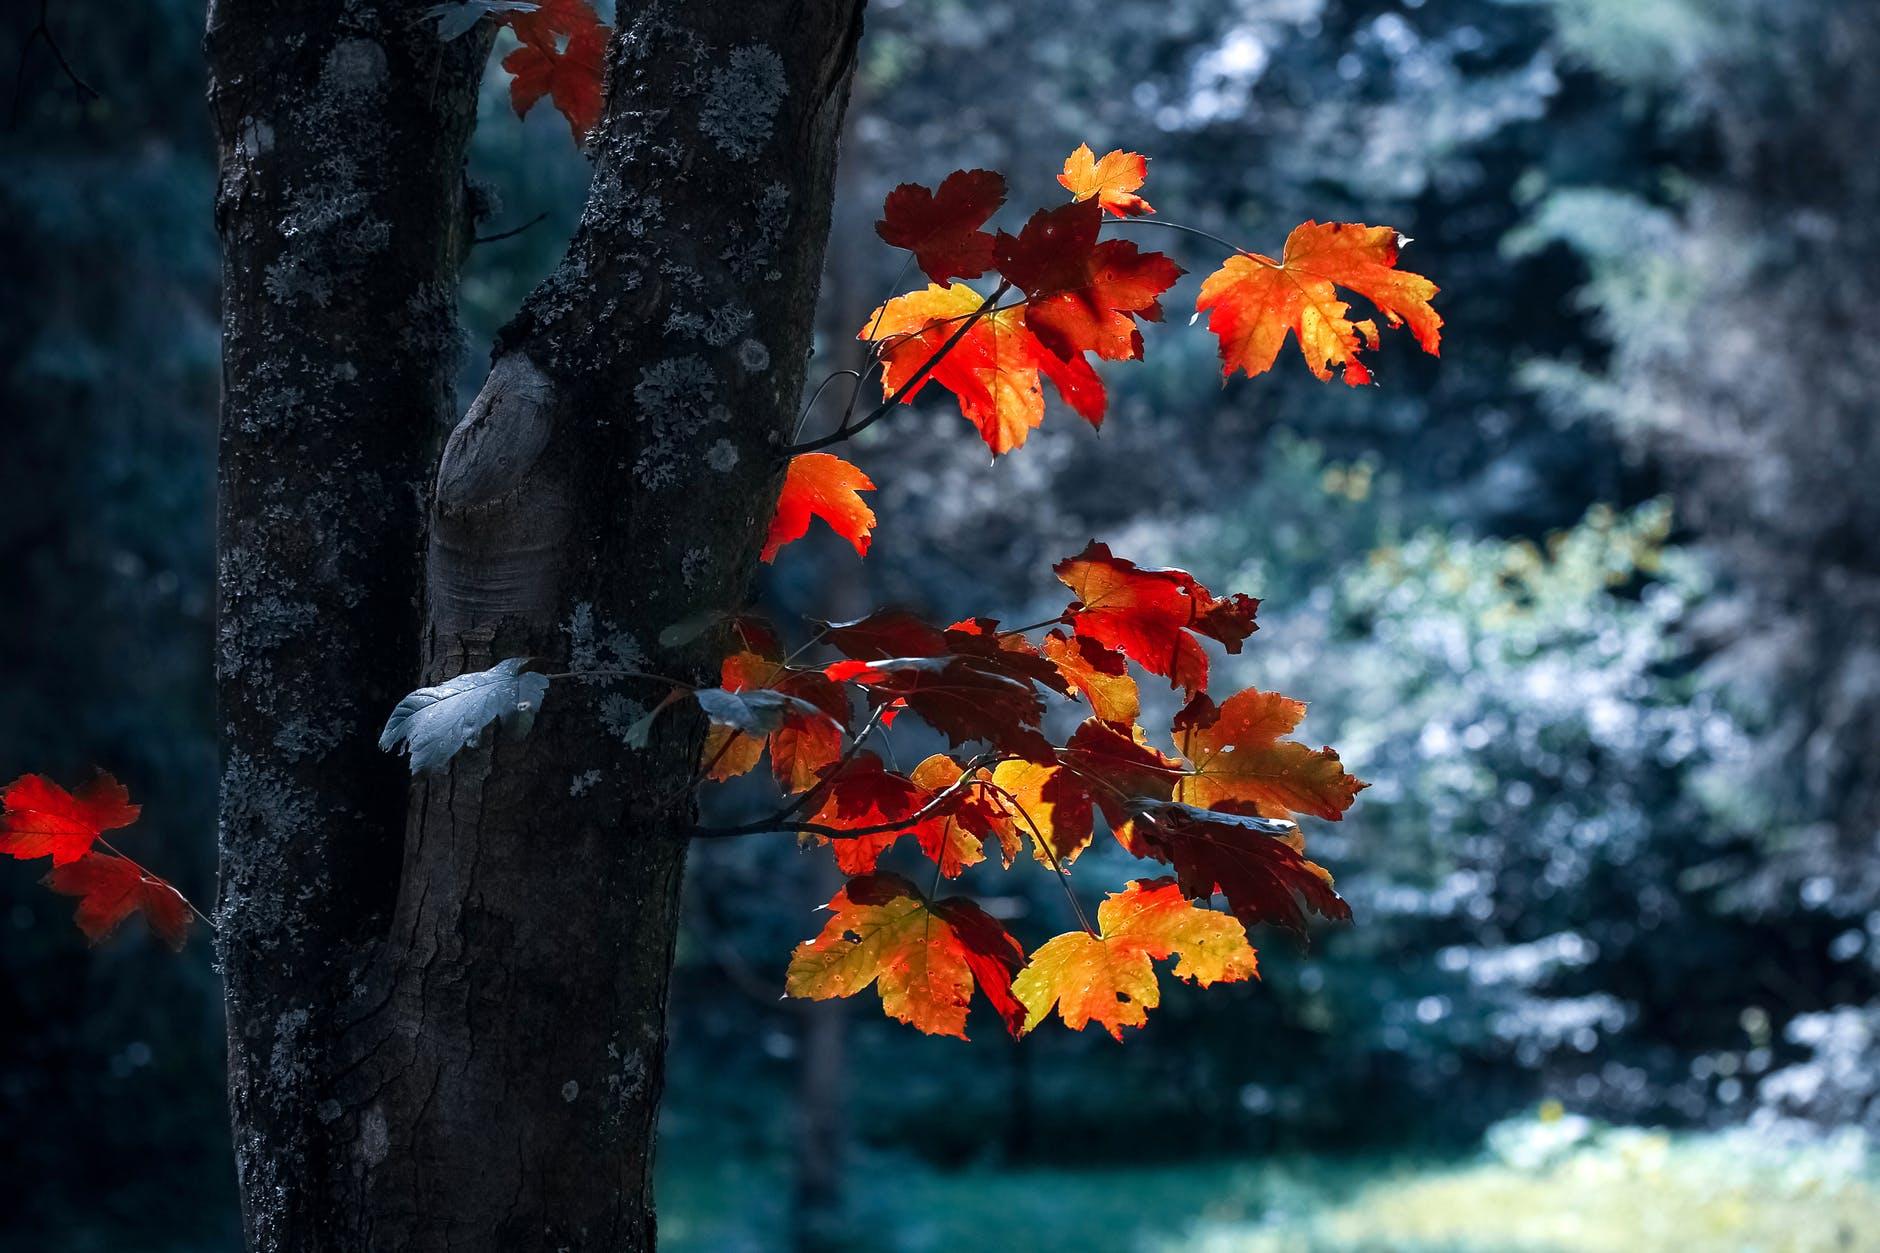 autumn autumn leaves blur close up